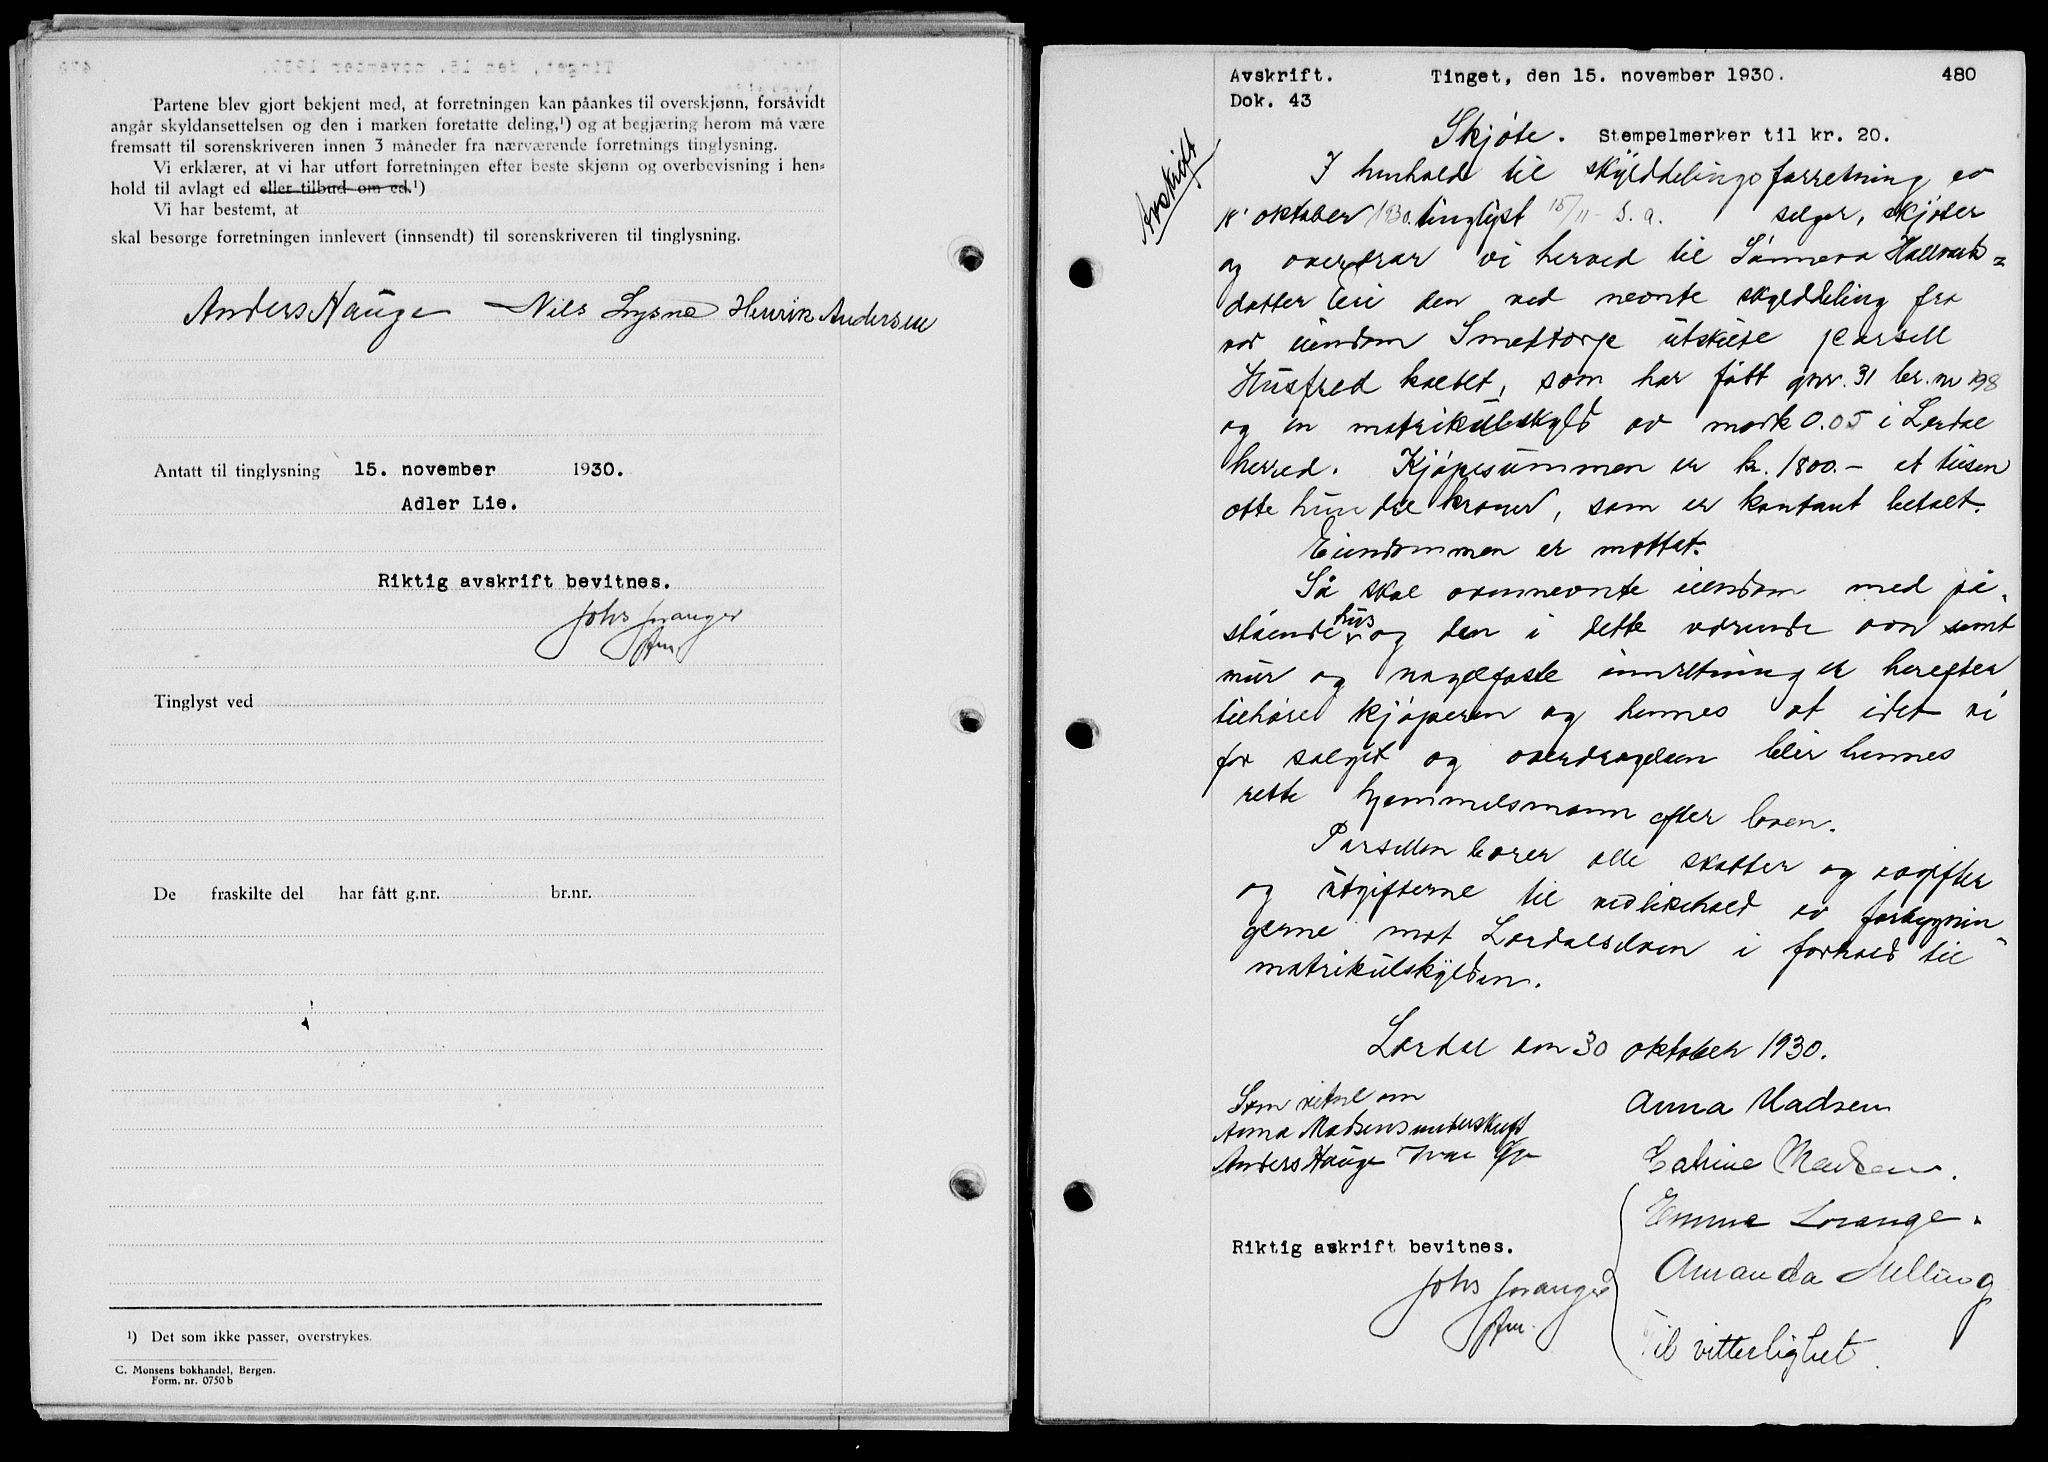 SAB, Indre Sogn sorenskriveri, G/Gb/Gba/L0025: Pantebok nr. II.B.25, 1930-1930, s. 480